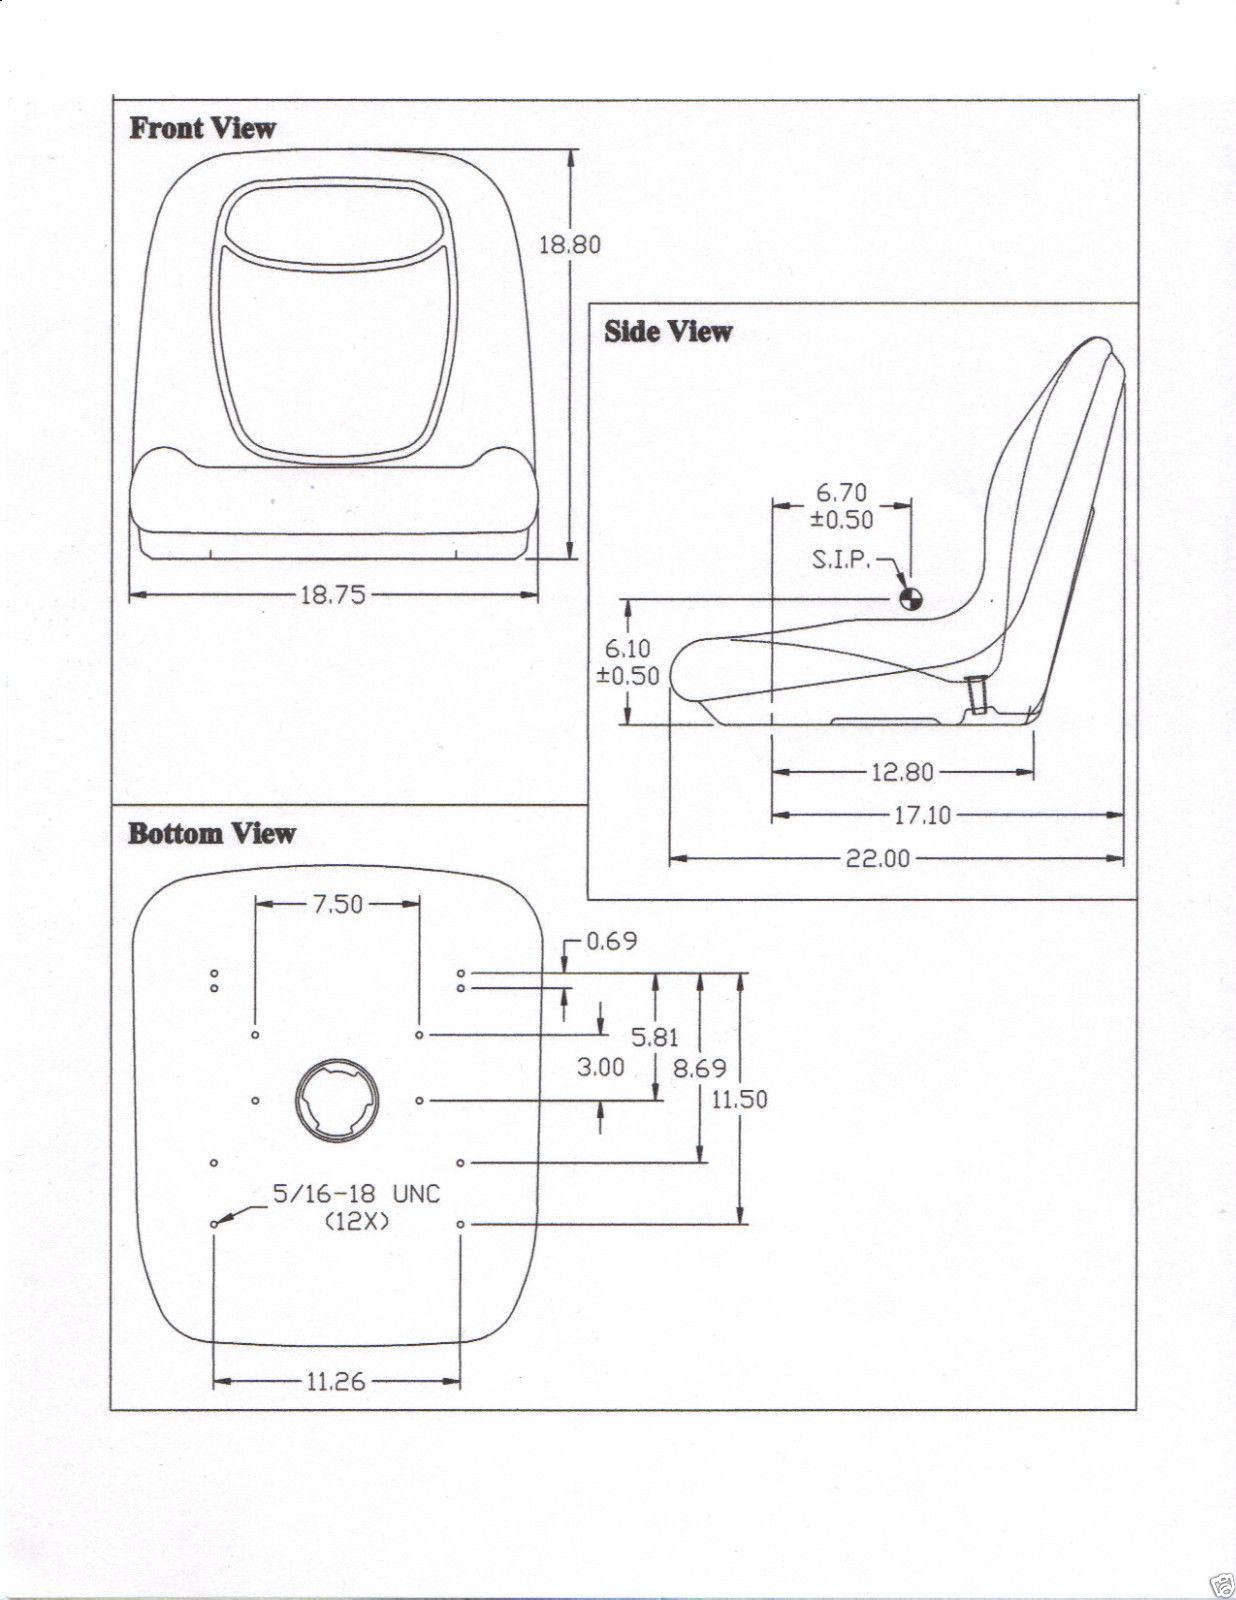 YELLOW SEAT FOR JOHN DEERE ZERO TURN MOWER Z TRAK M653M655M665717A727A BI 151699570196 7 yellow seat for john deere zero turn mower z trak, m653, m655 john deere 737 wiring diagram at suagrazia.org